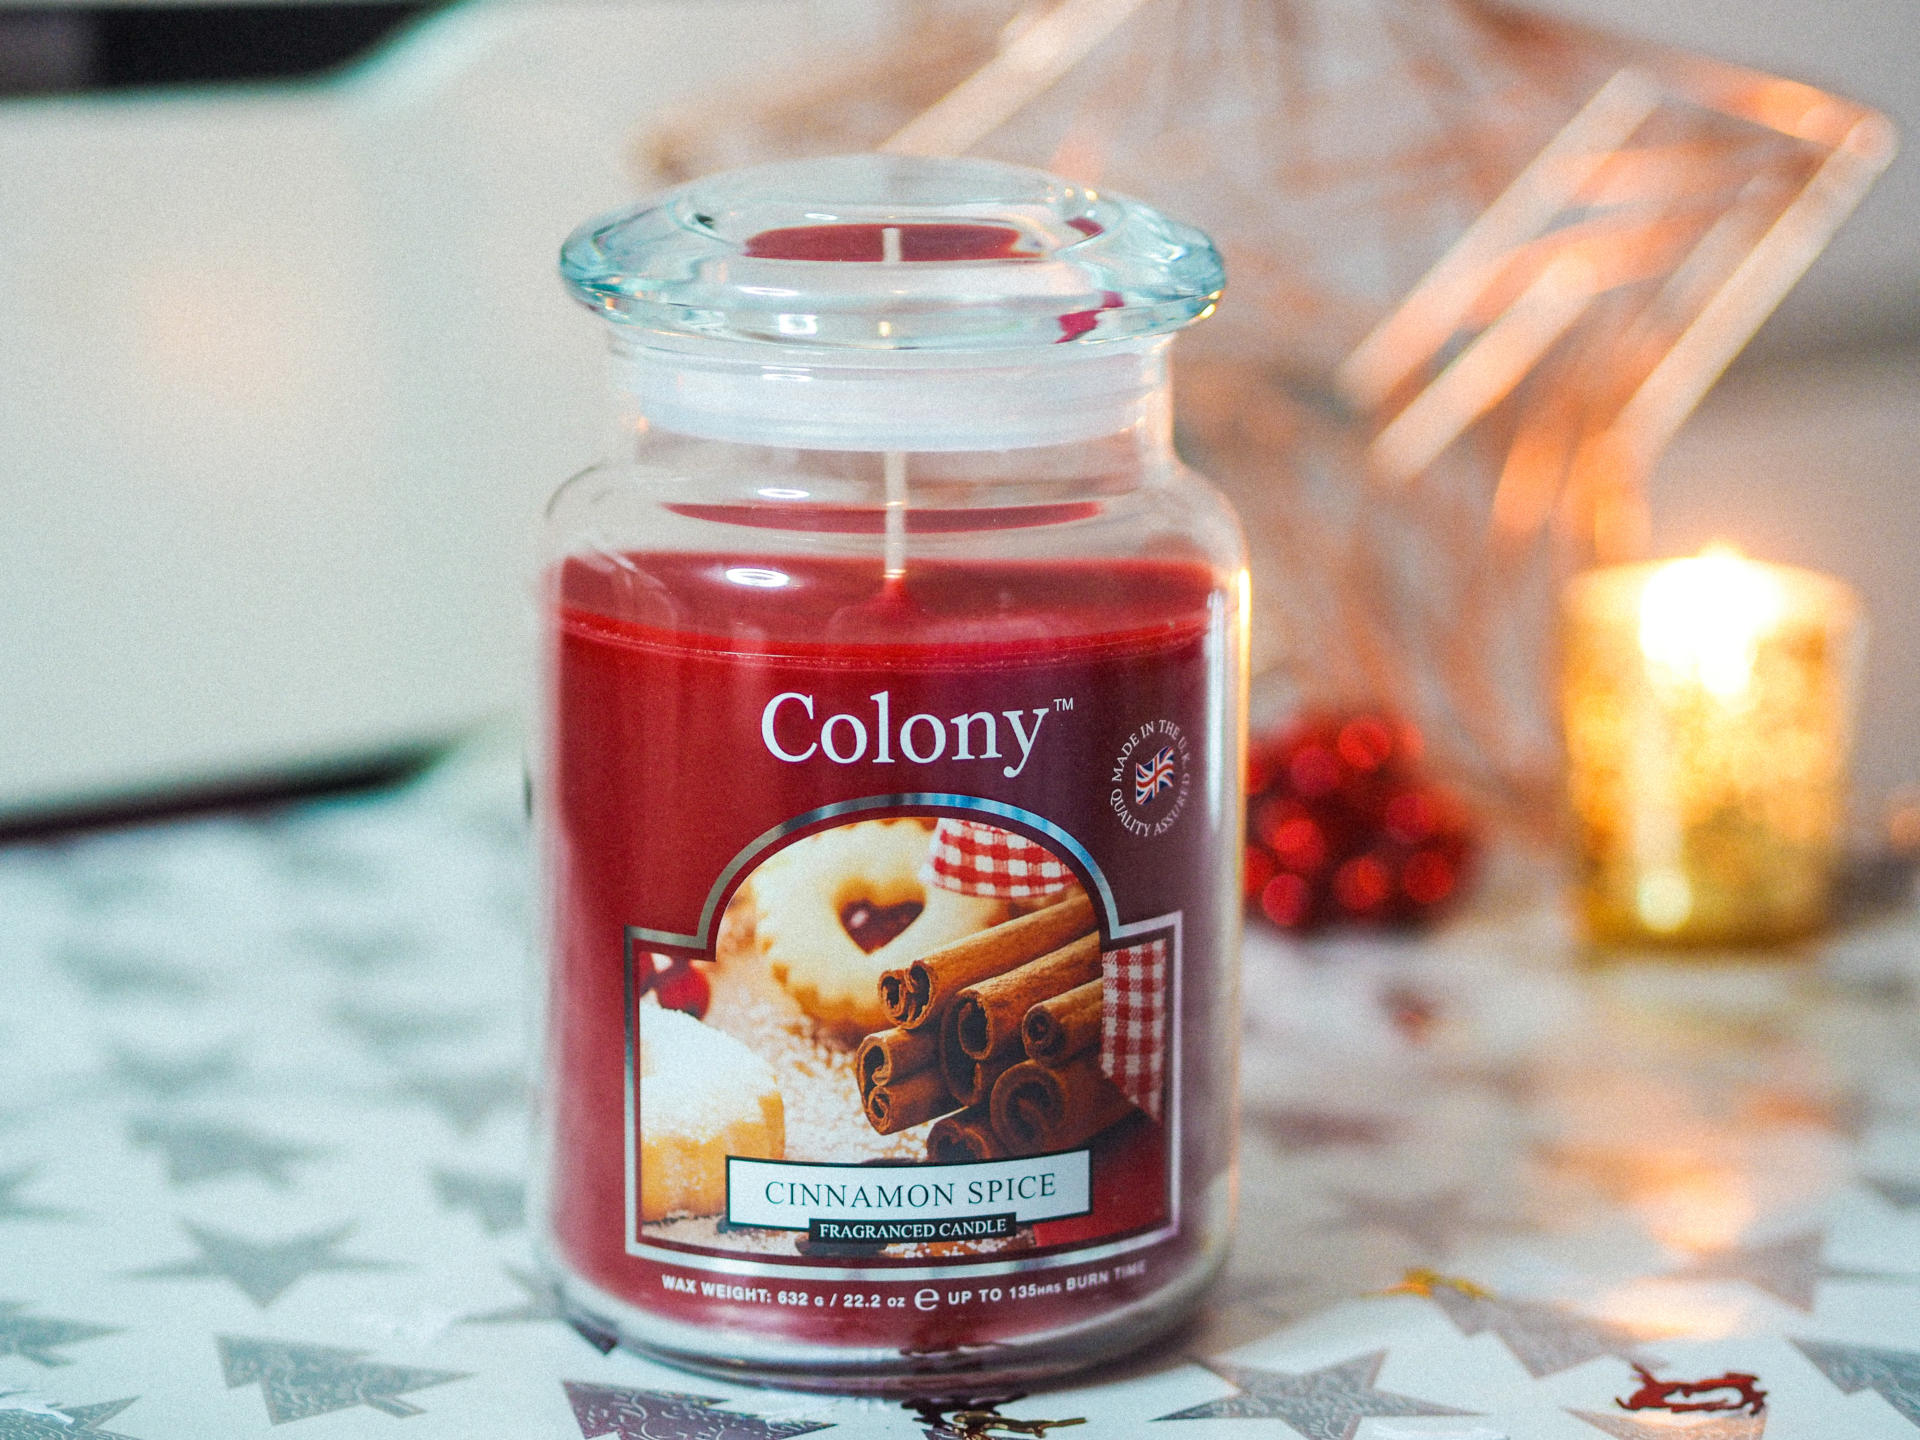 Win a Wax Lyrical Colony Cinnamon Spice Candle Jar - Rachel Nicole UK Blogger